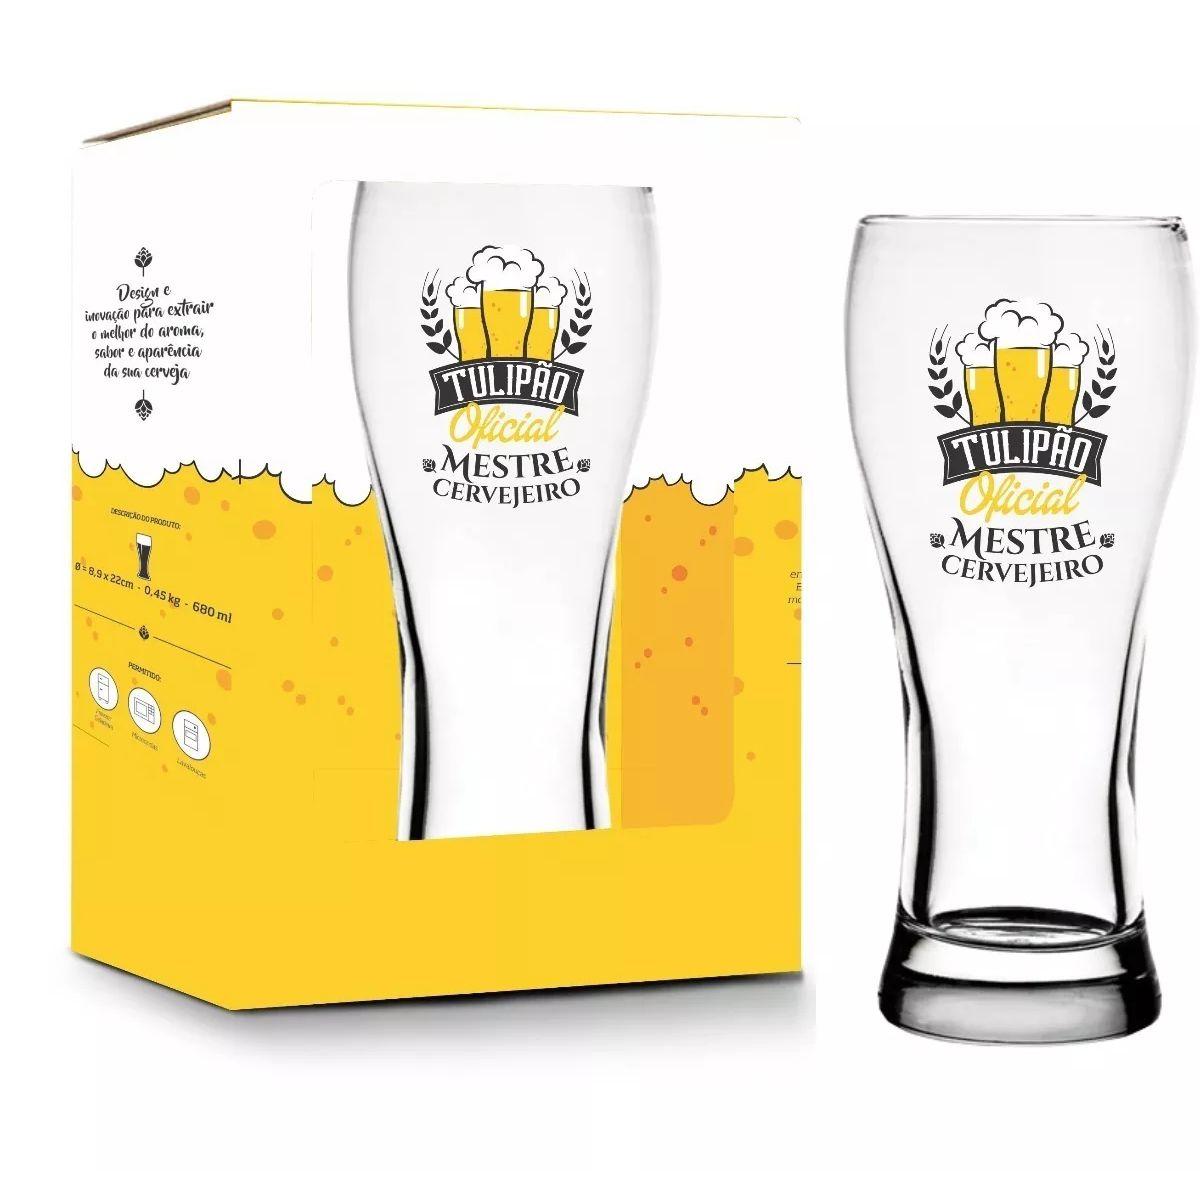 Copo Joinville 680ml - Mestre Cervejeiro